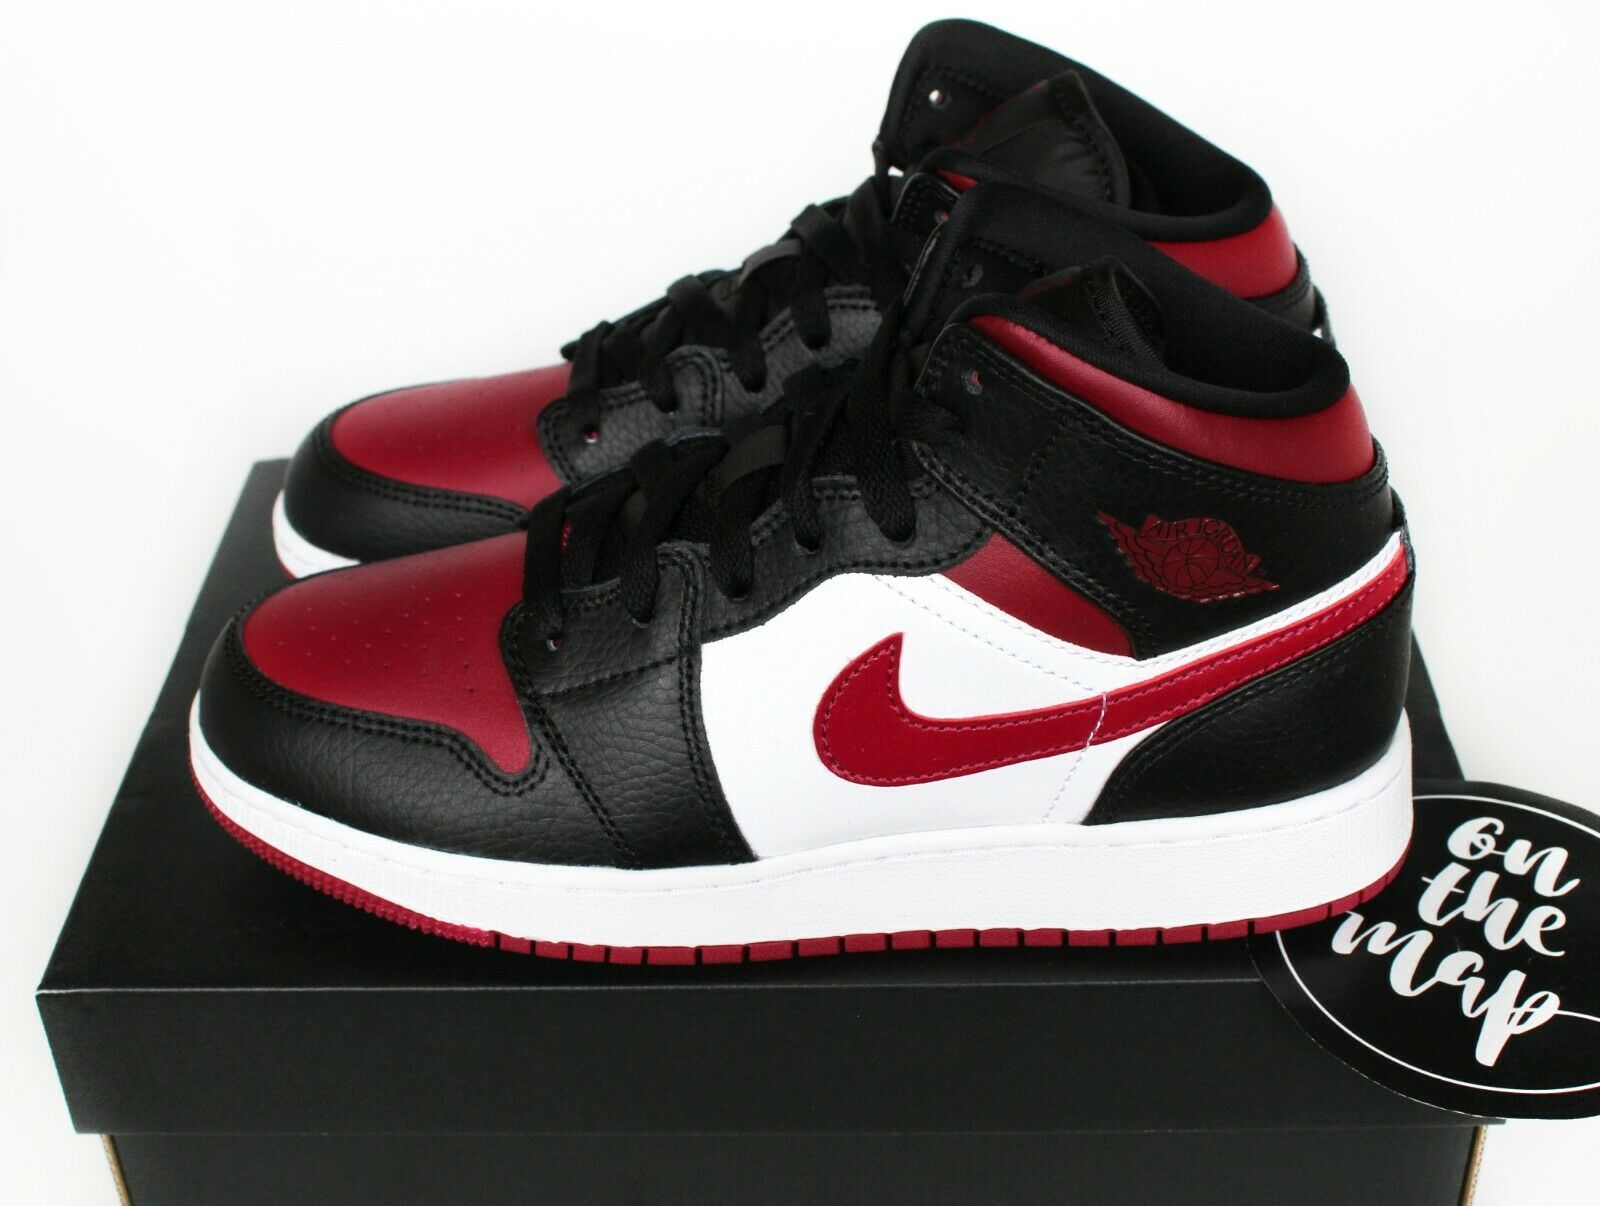 2014 Nike Air Jordan 1 Mid Size 4 5 Blue Infrared Black White